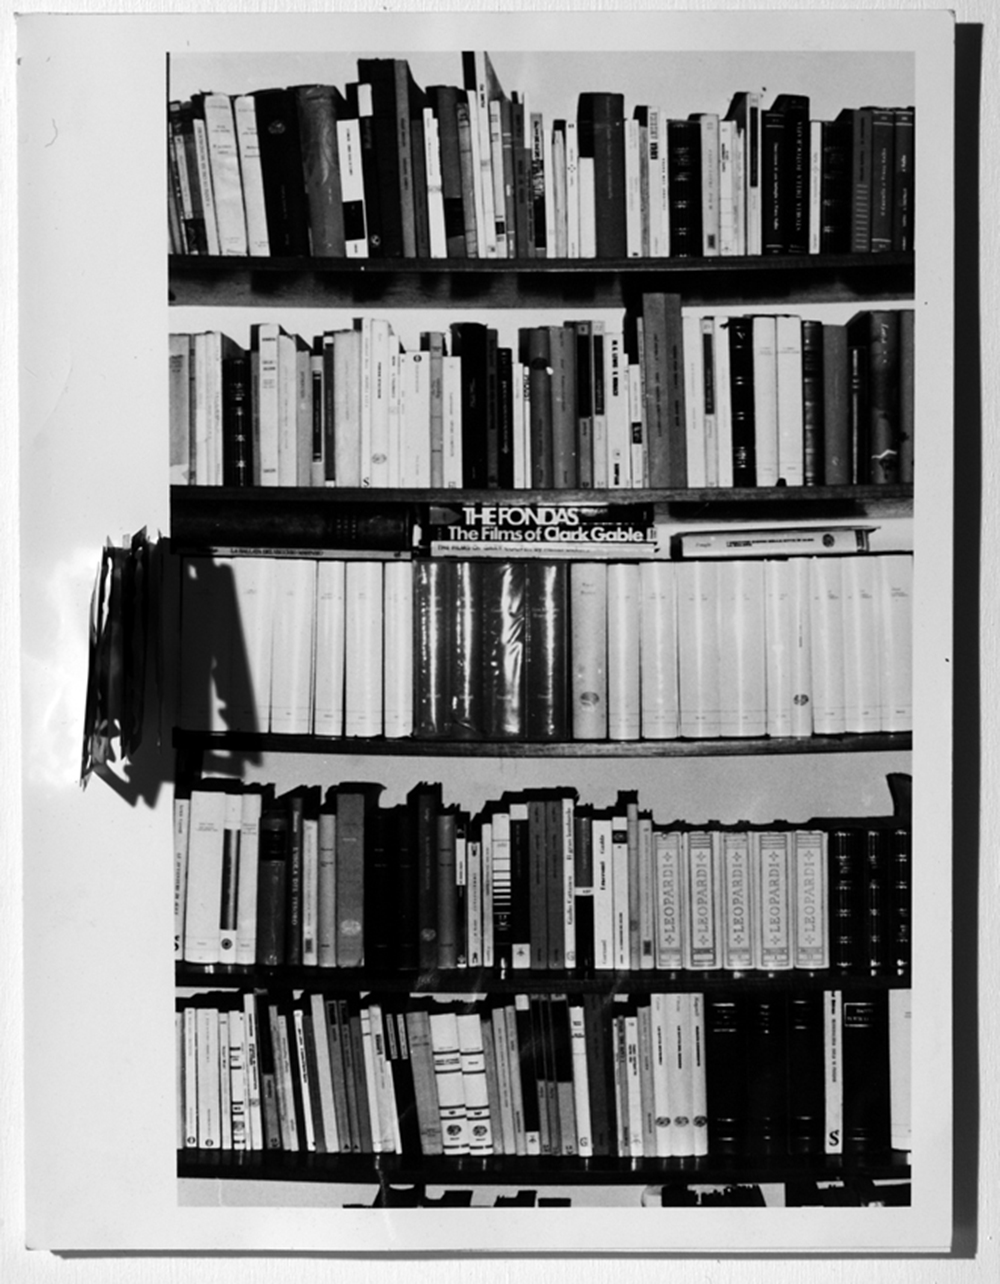 Antropologie, 1976-78, stampa ai sali d'argento e lamette, cm 18x13